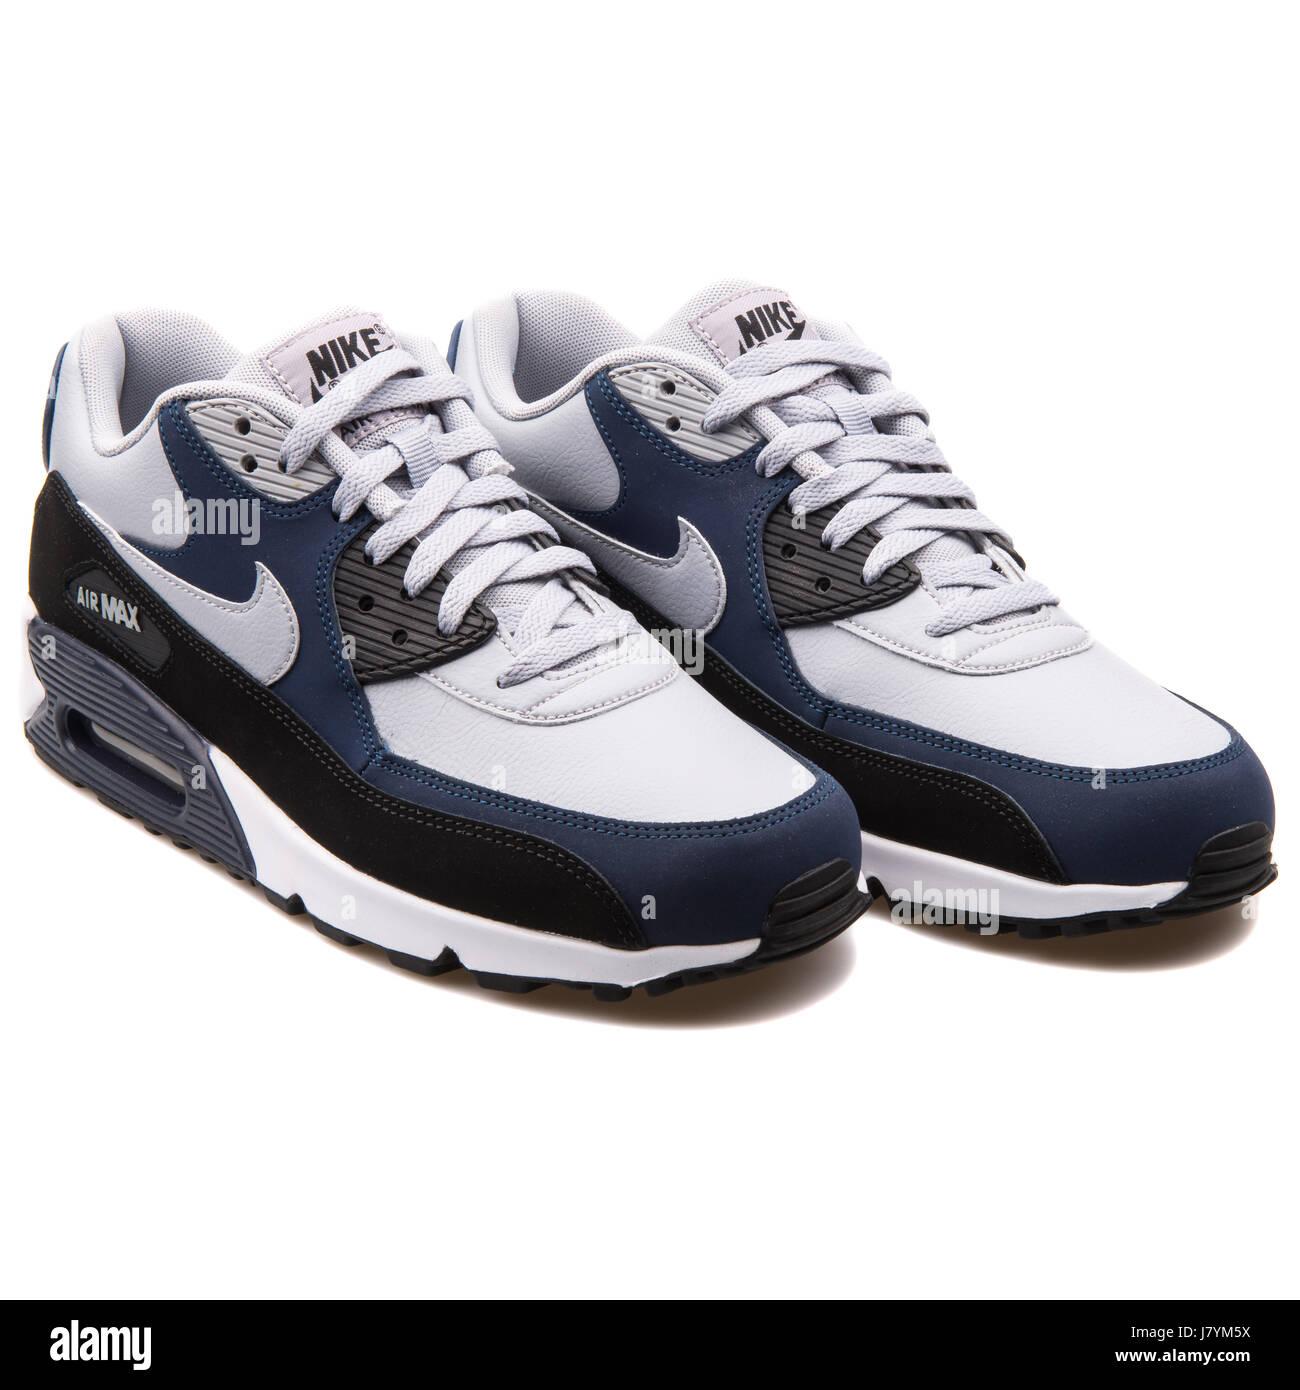 huge selection of 235e2 f1c65 Sneakers von Nike Air Max 90 LTR grau Marineblau Männer Sport - 652980-011